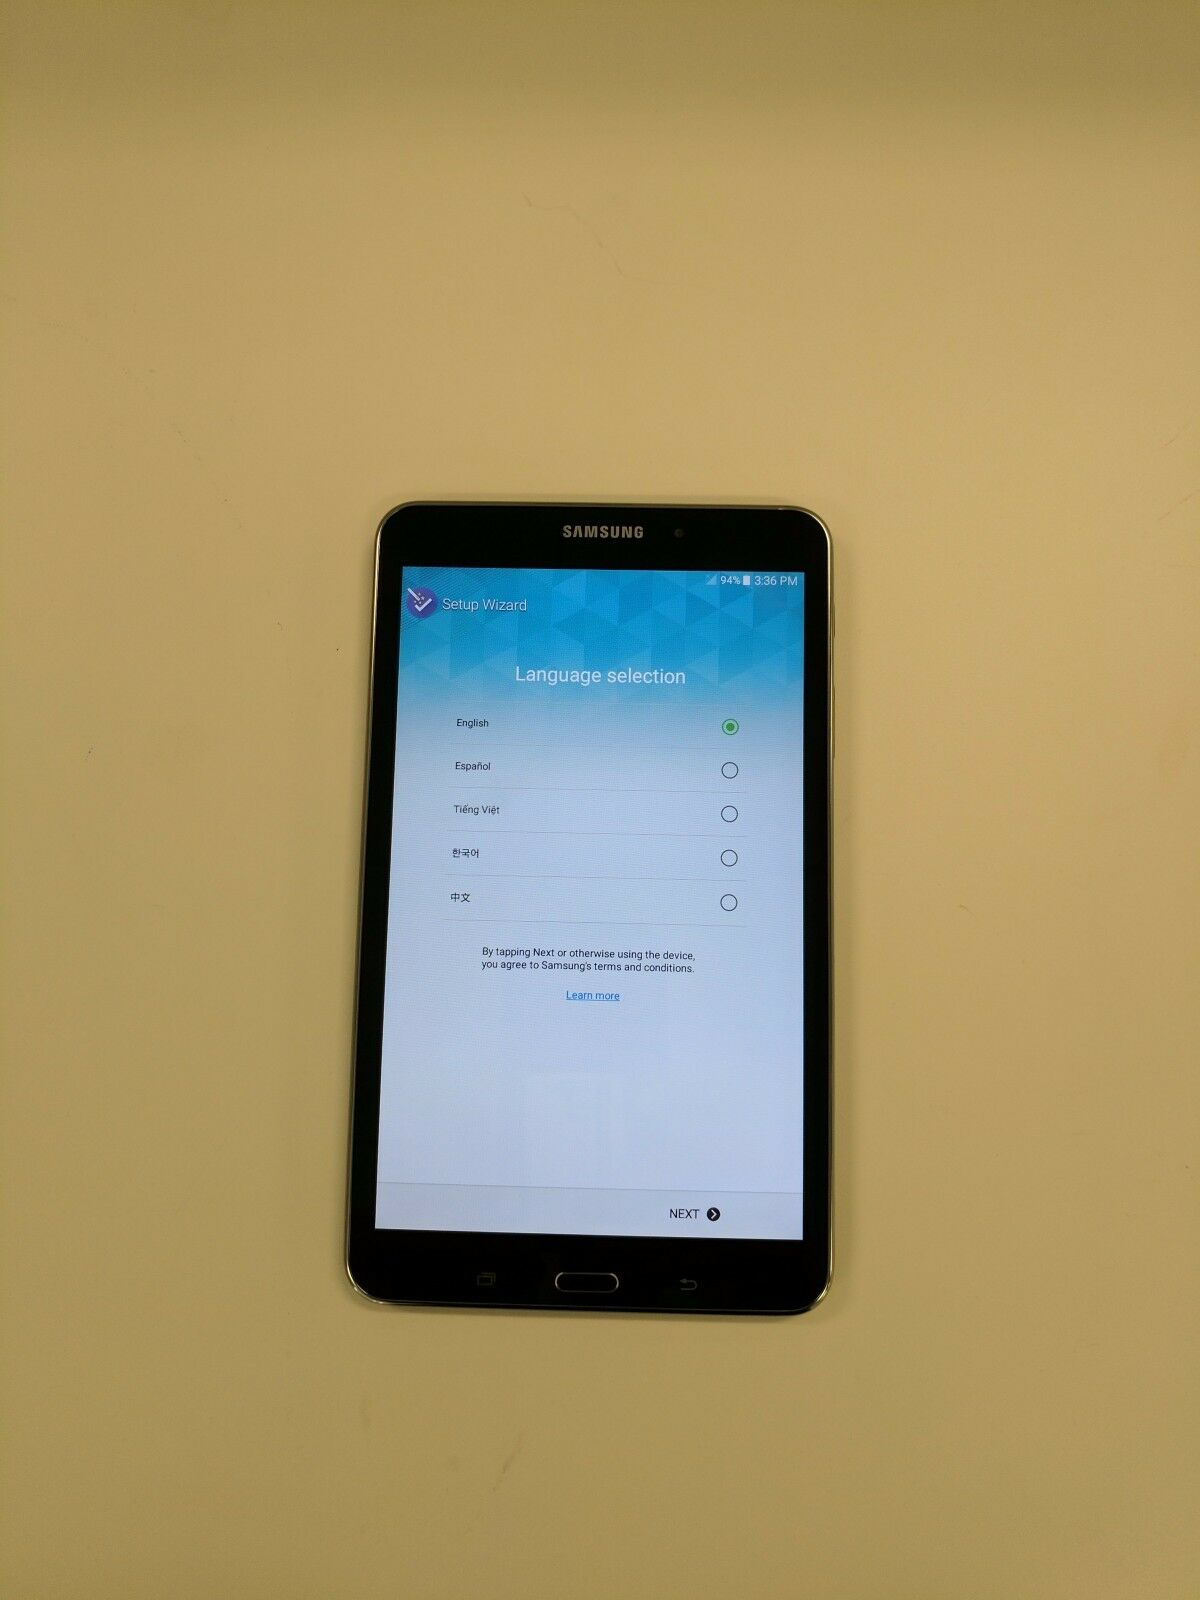 Samsung Galaxy Tab 4 8.0 SM-T337V 16GB Wi-Fi + 4G Verizon Wireless Tablet